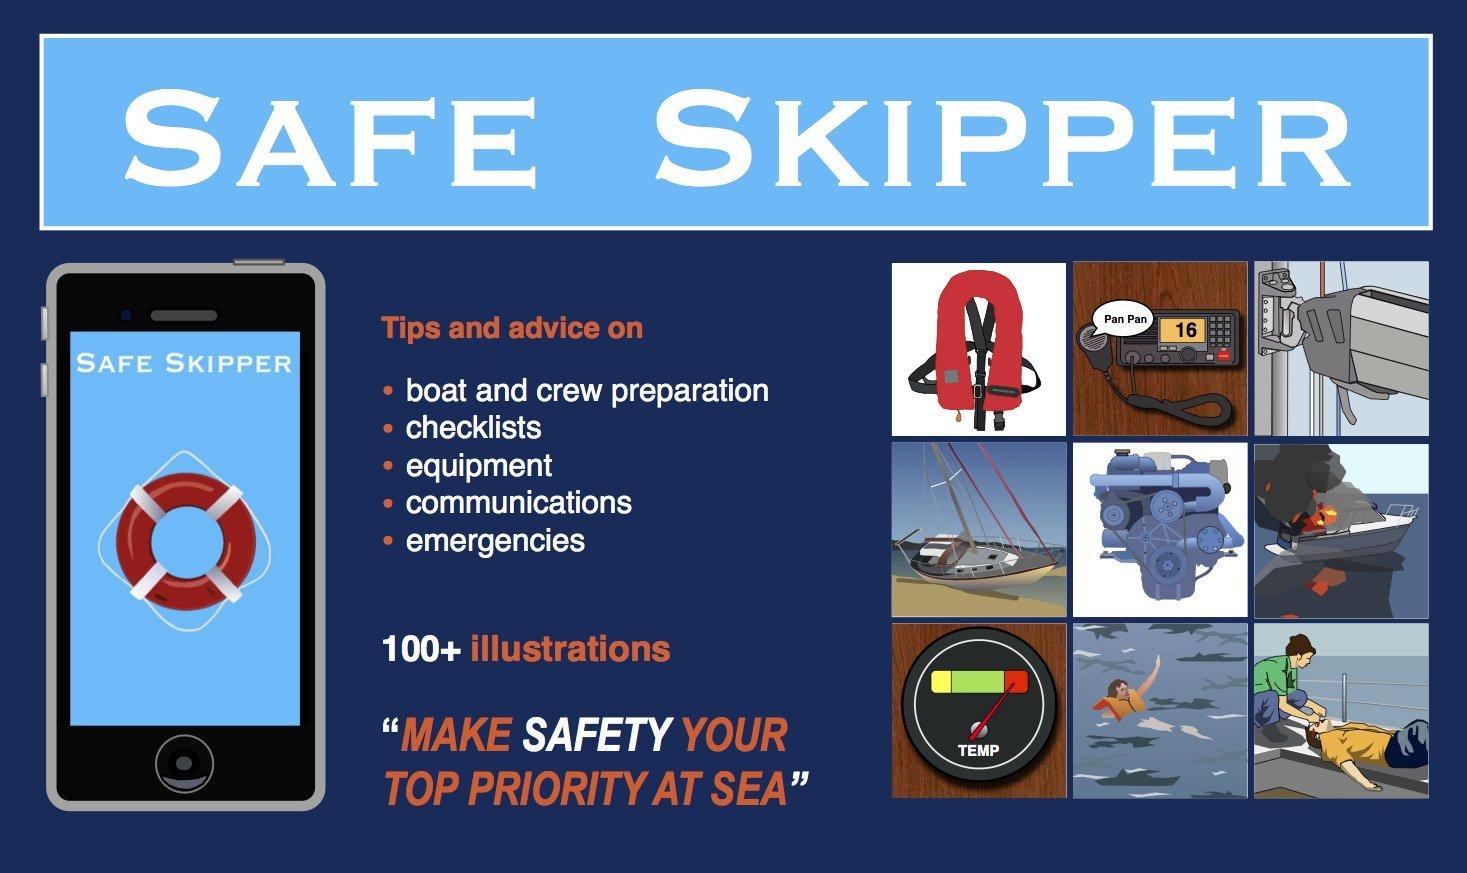 Safe Skip web page